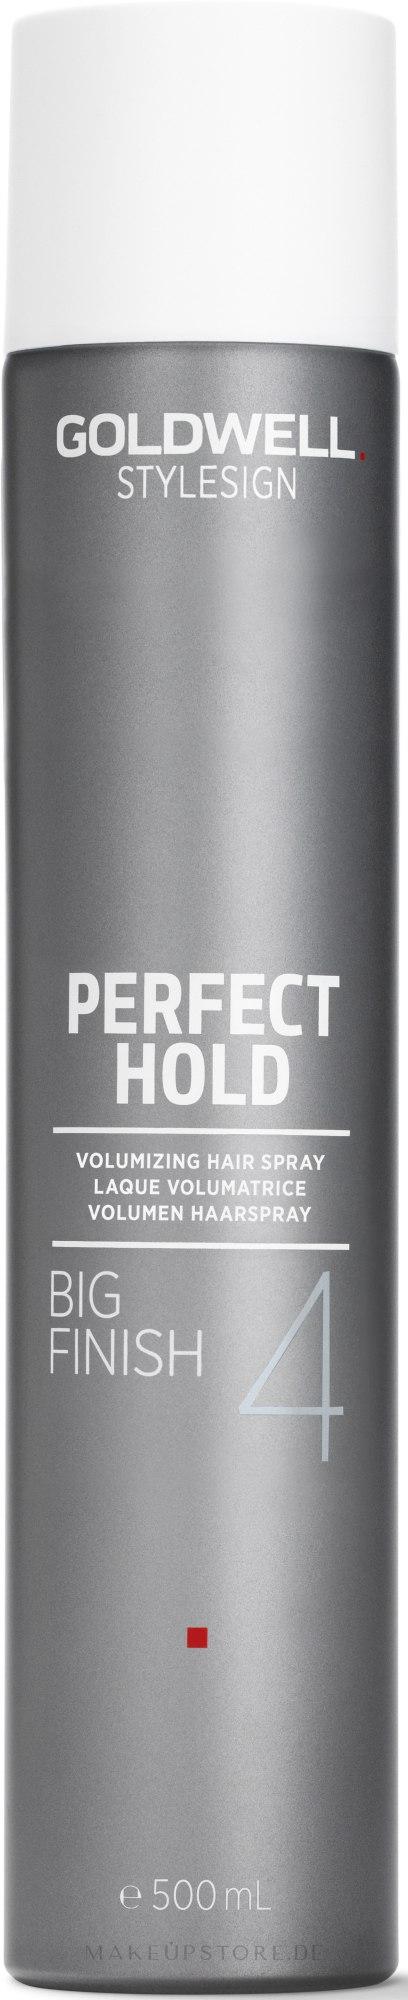 Volumen Haarspray Haltegrad 4 - Goldwell Style Sign Perfect Hold Big Finish Volumizing Hairspray — Bild 500 ml